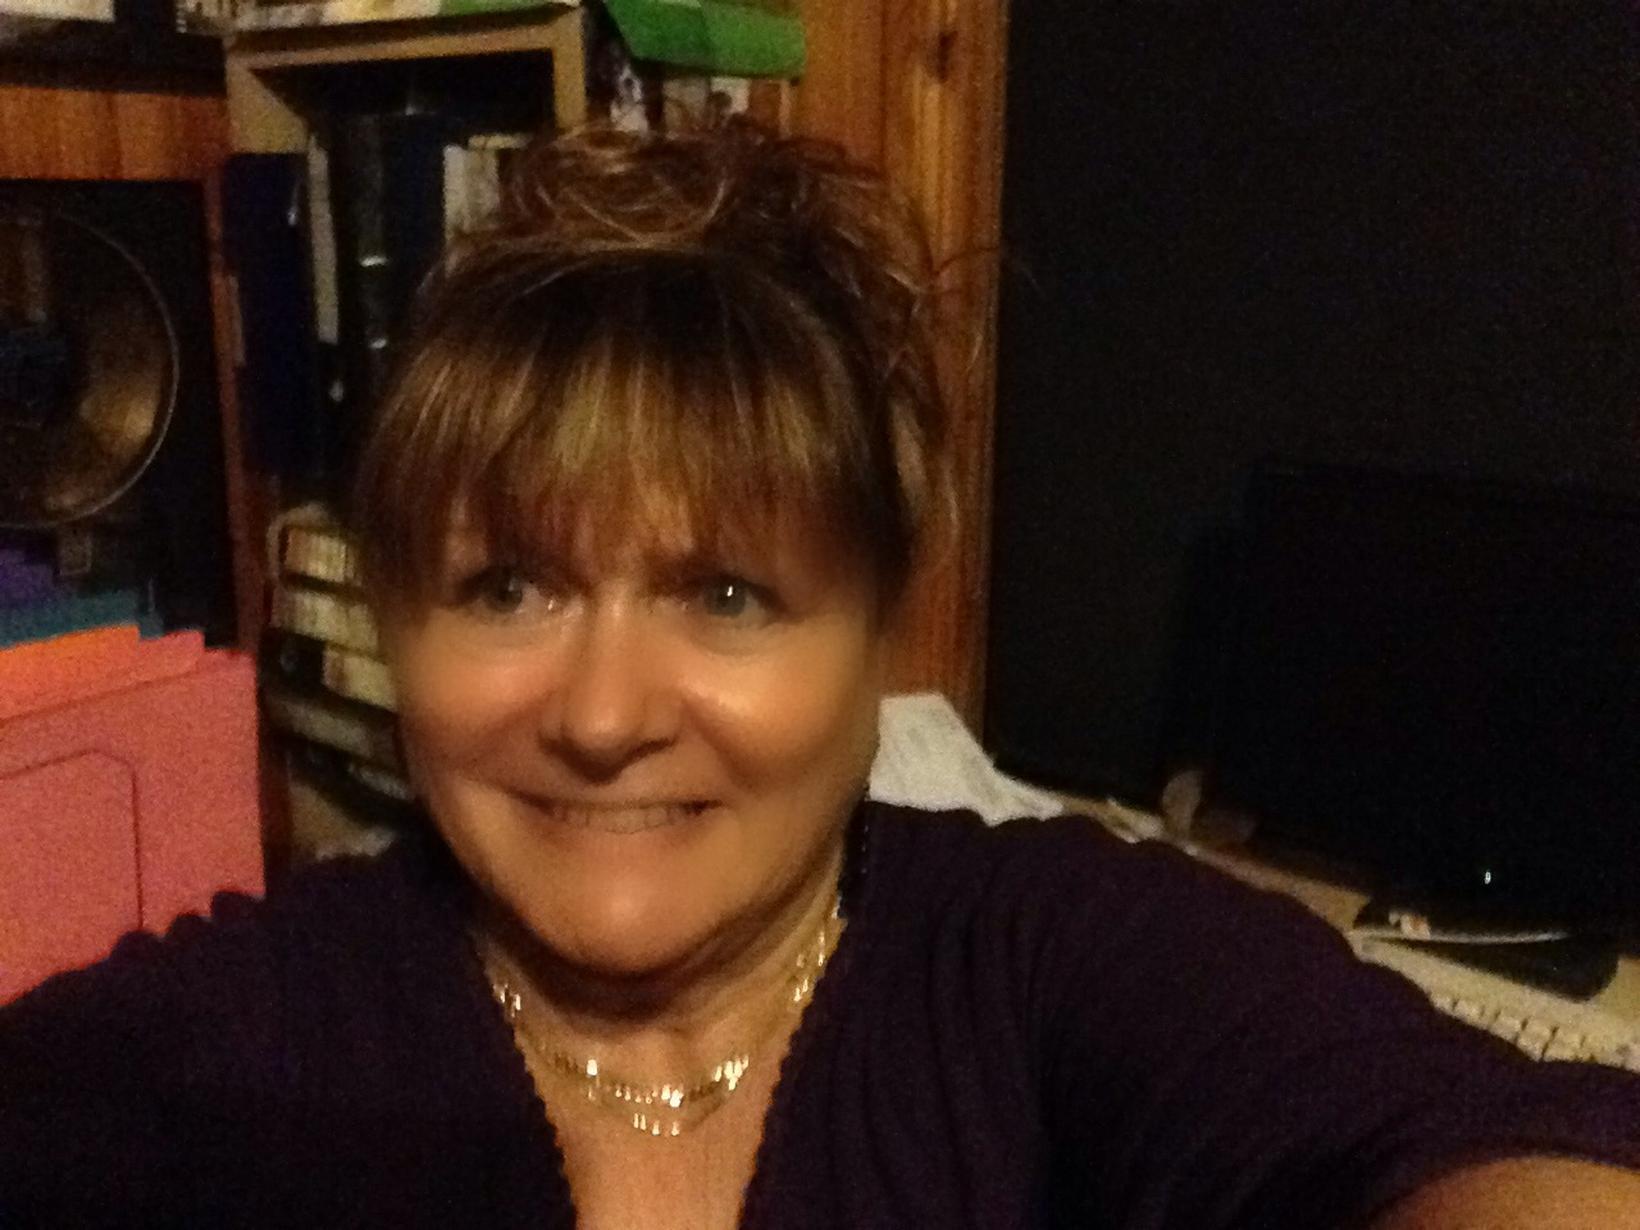 Jacqueline from Toodyay, Western Australia, Australia